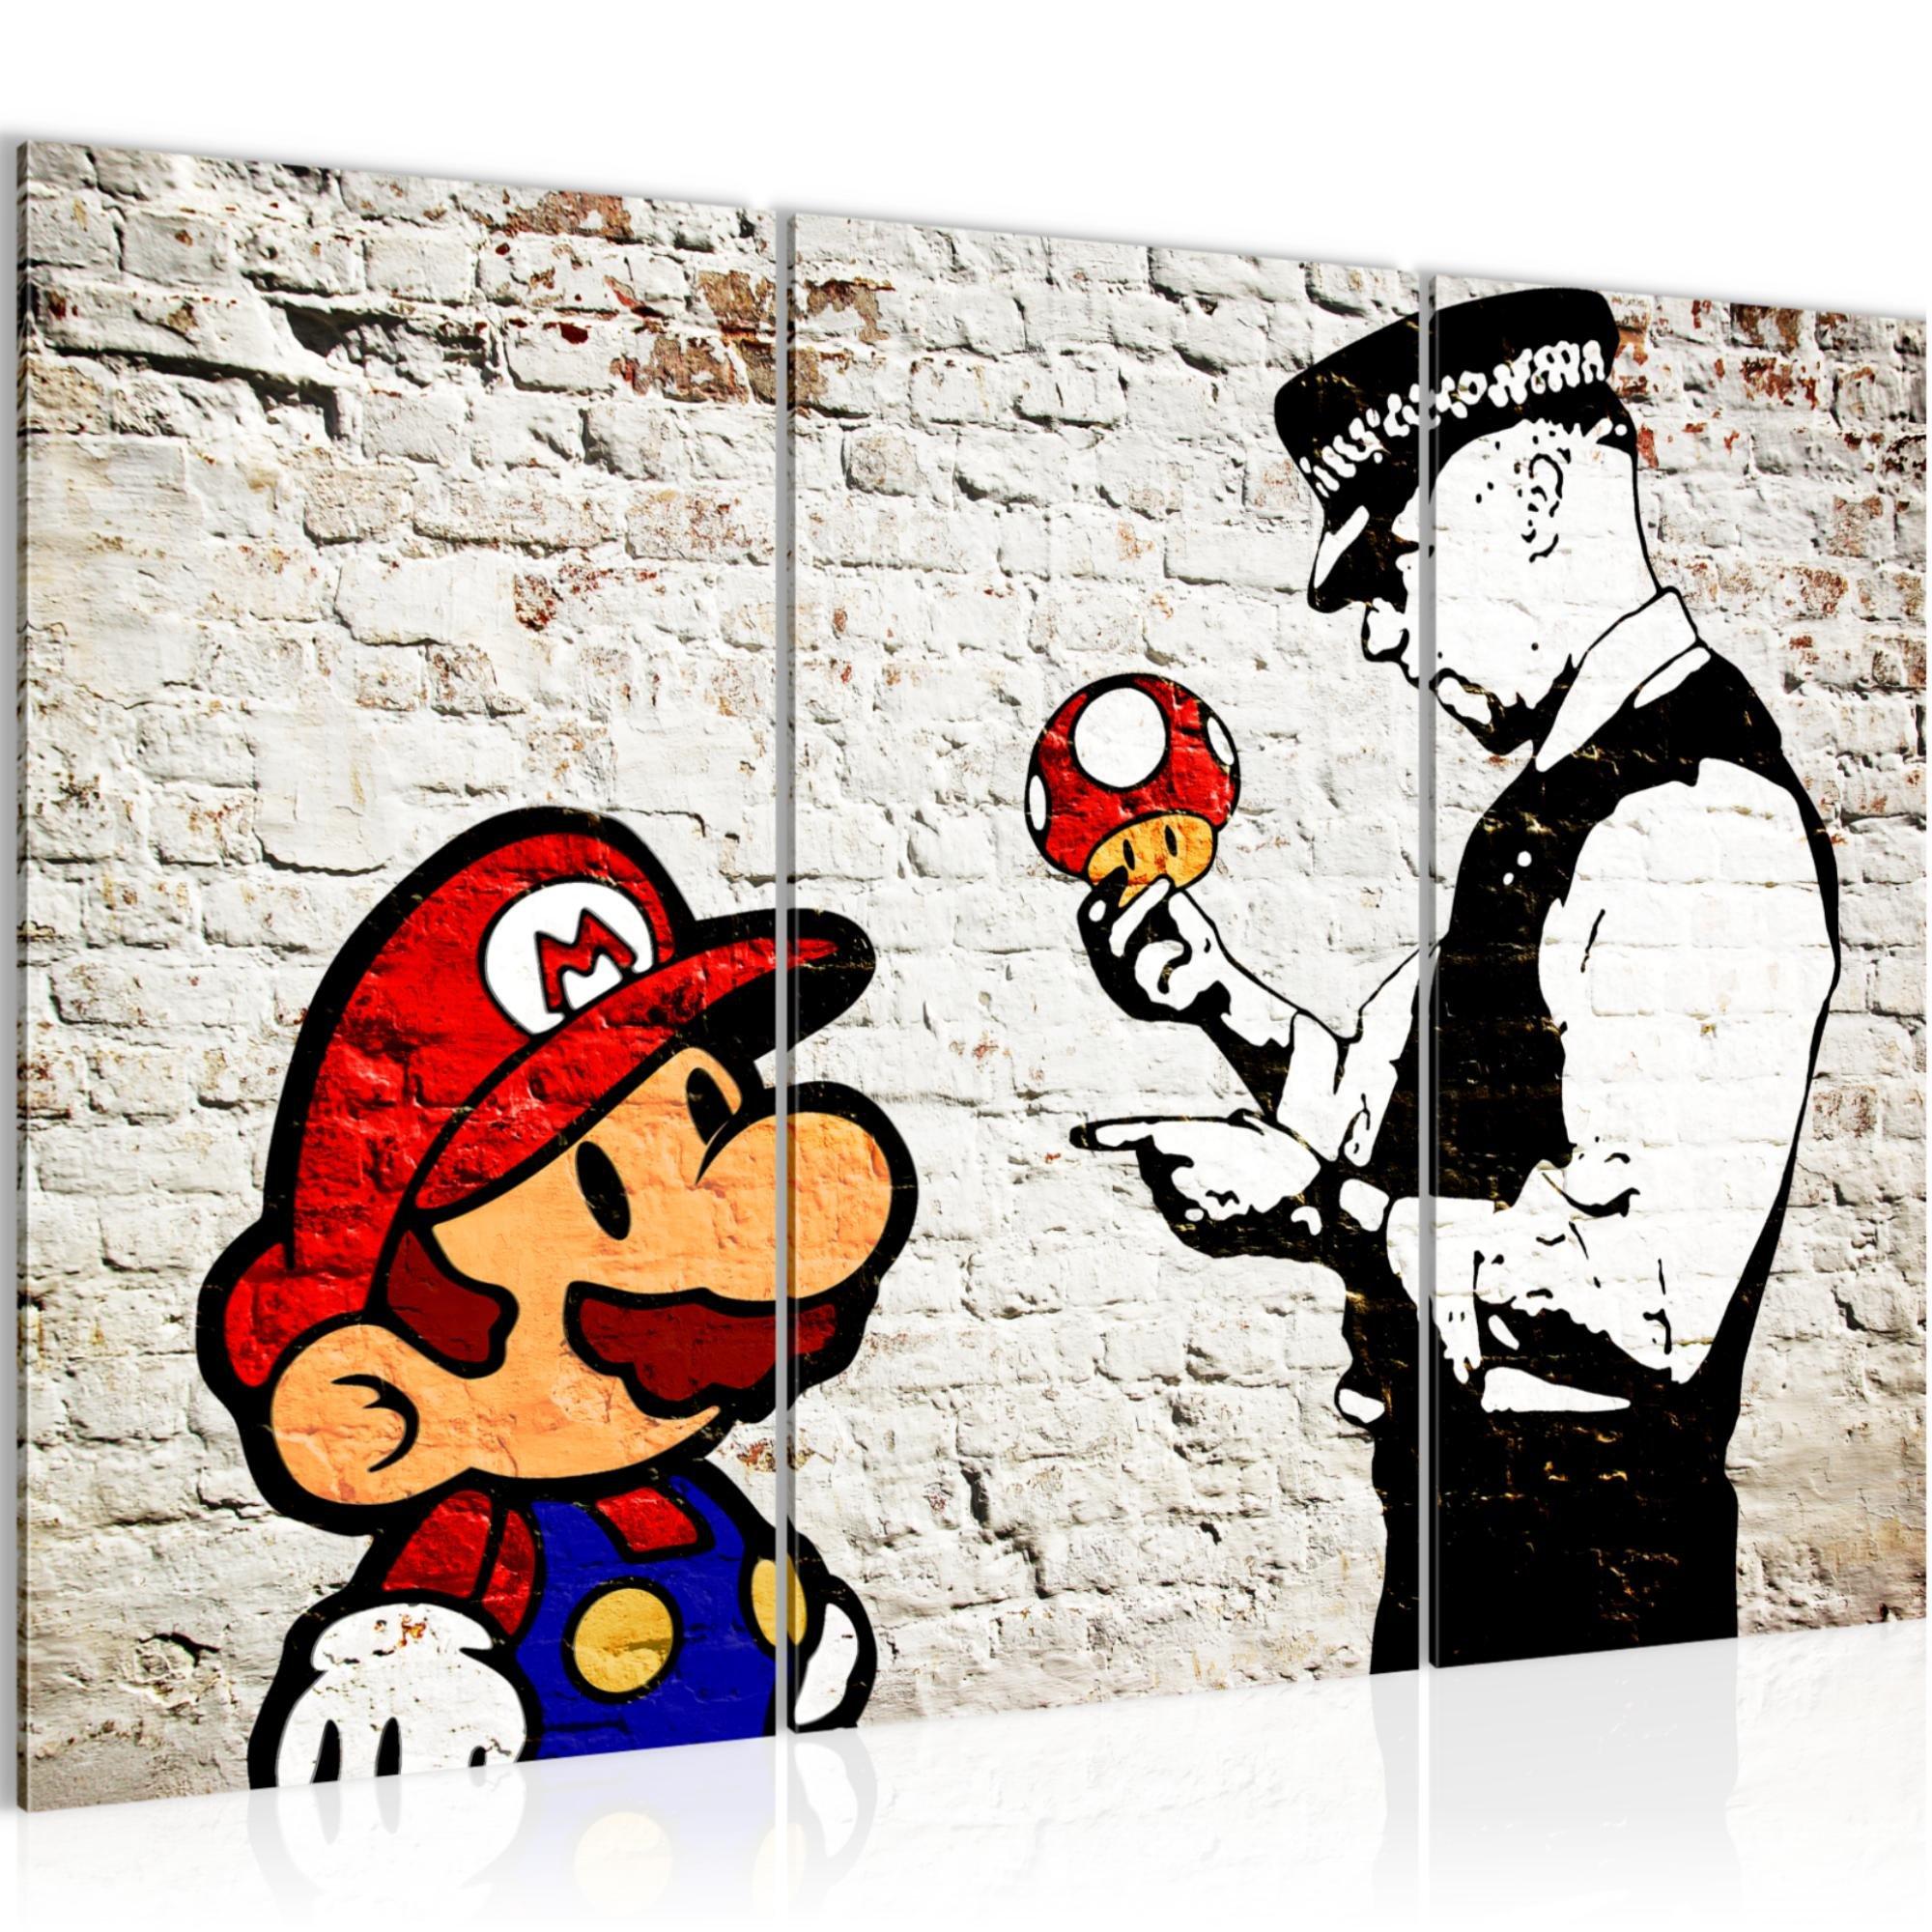 Bilder Mario And Cop Banksy Ziegel Mauer Wandbild 120 X 80 Cm Vlies    Leinwand Bild